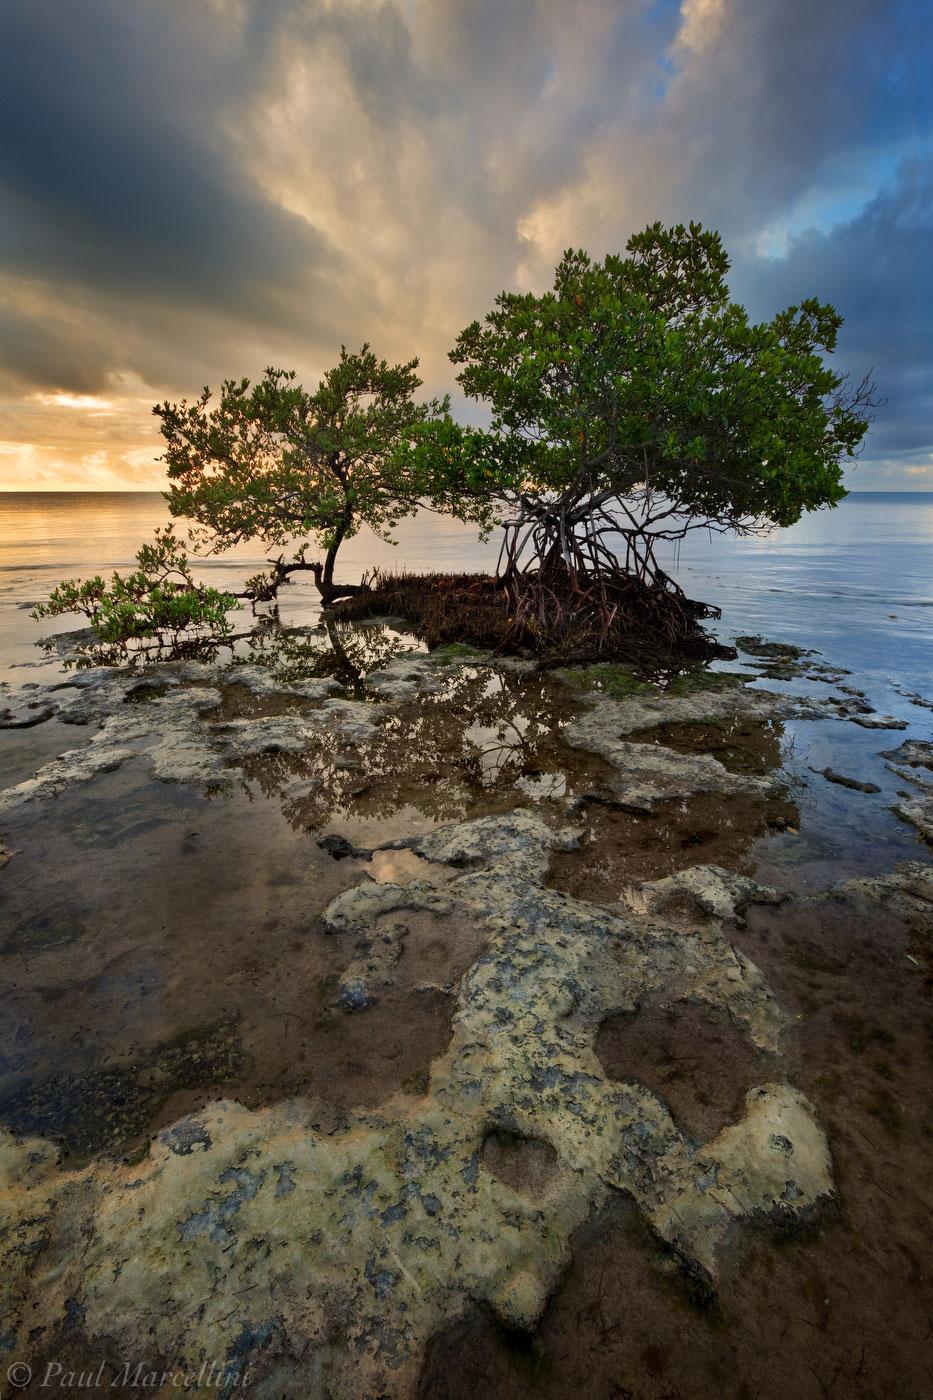 red mangrove, black mangrove, florida, keys, big pine, sunrise, florida keys, south florida, nature, photography, photo